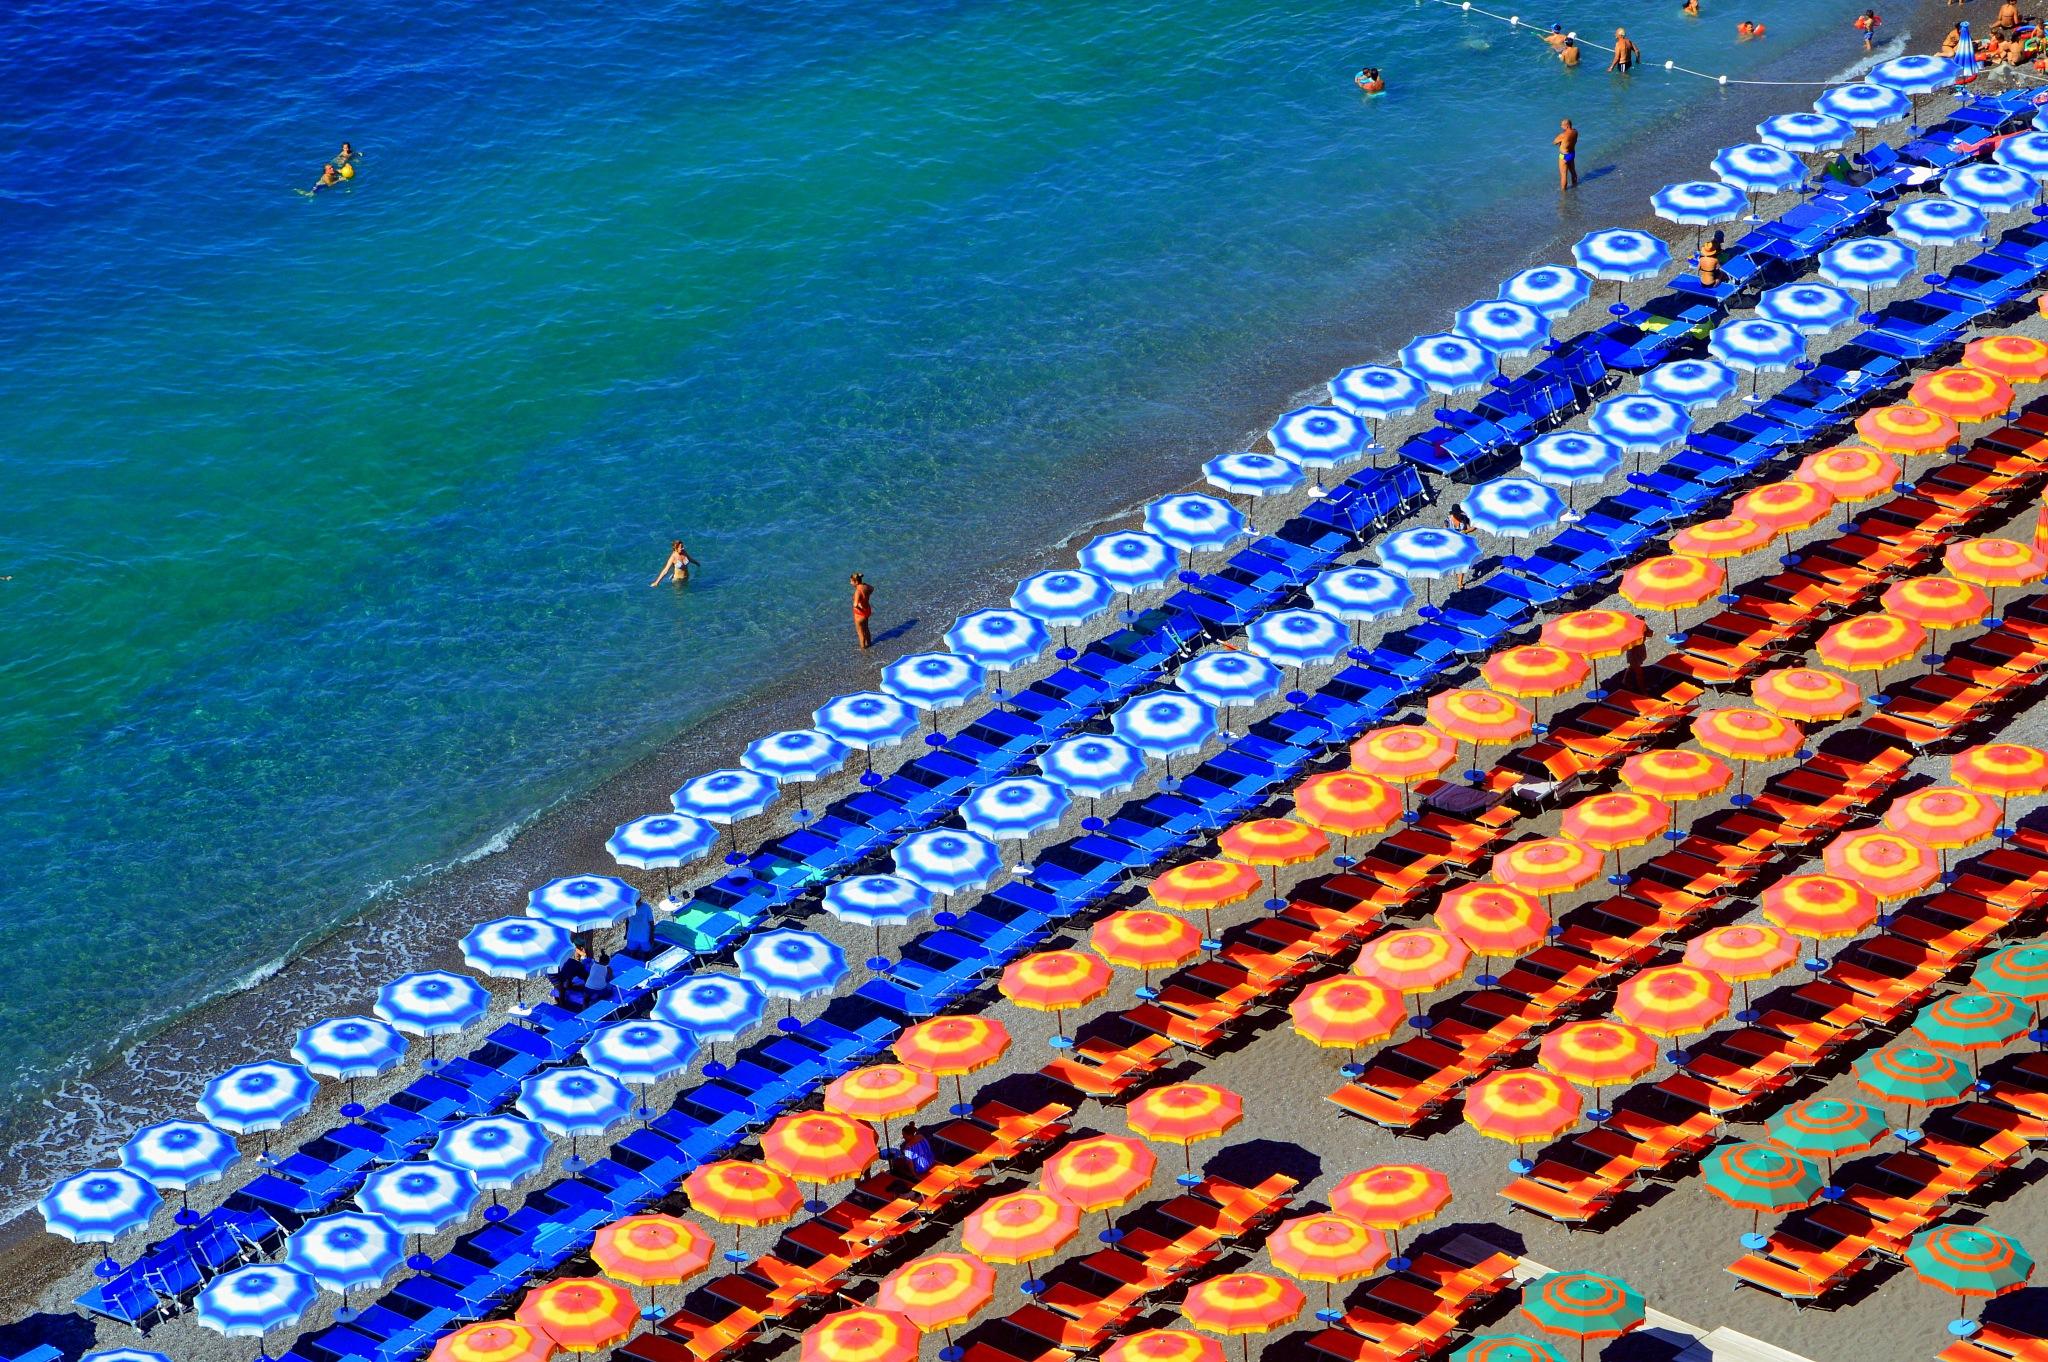 Beach in Positano by Frederico Domondon